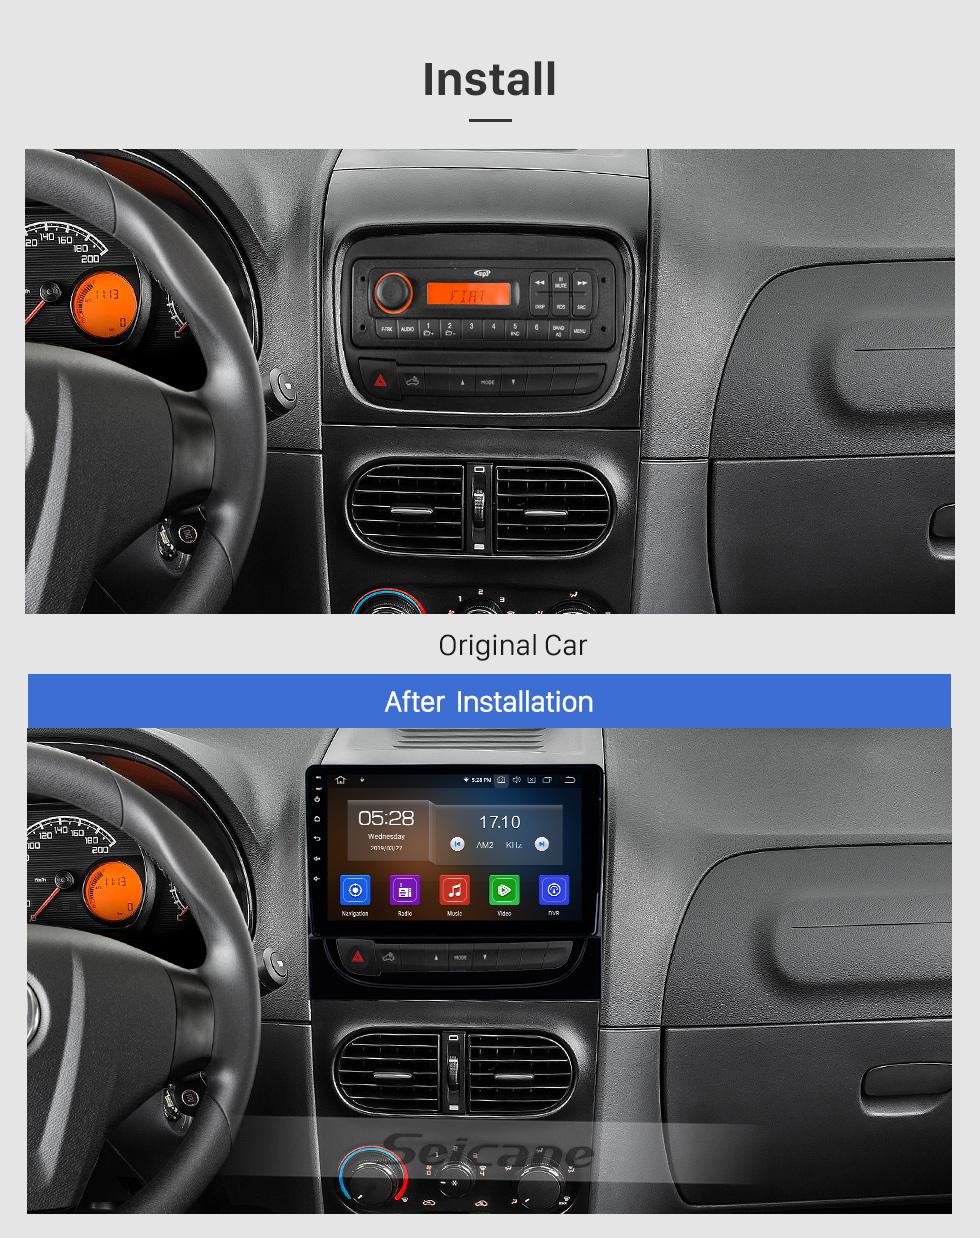 Seicane 2012-2016 Fiat Strada / cdea 9 pulgadas Android 9.0 Bluetooth Radio HD Pantalla táctil Navegación GPS Soporte de Carplay USB Mirror Link 1080P Video 4G OBD